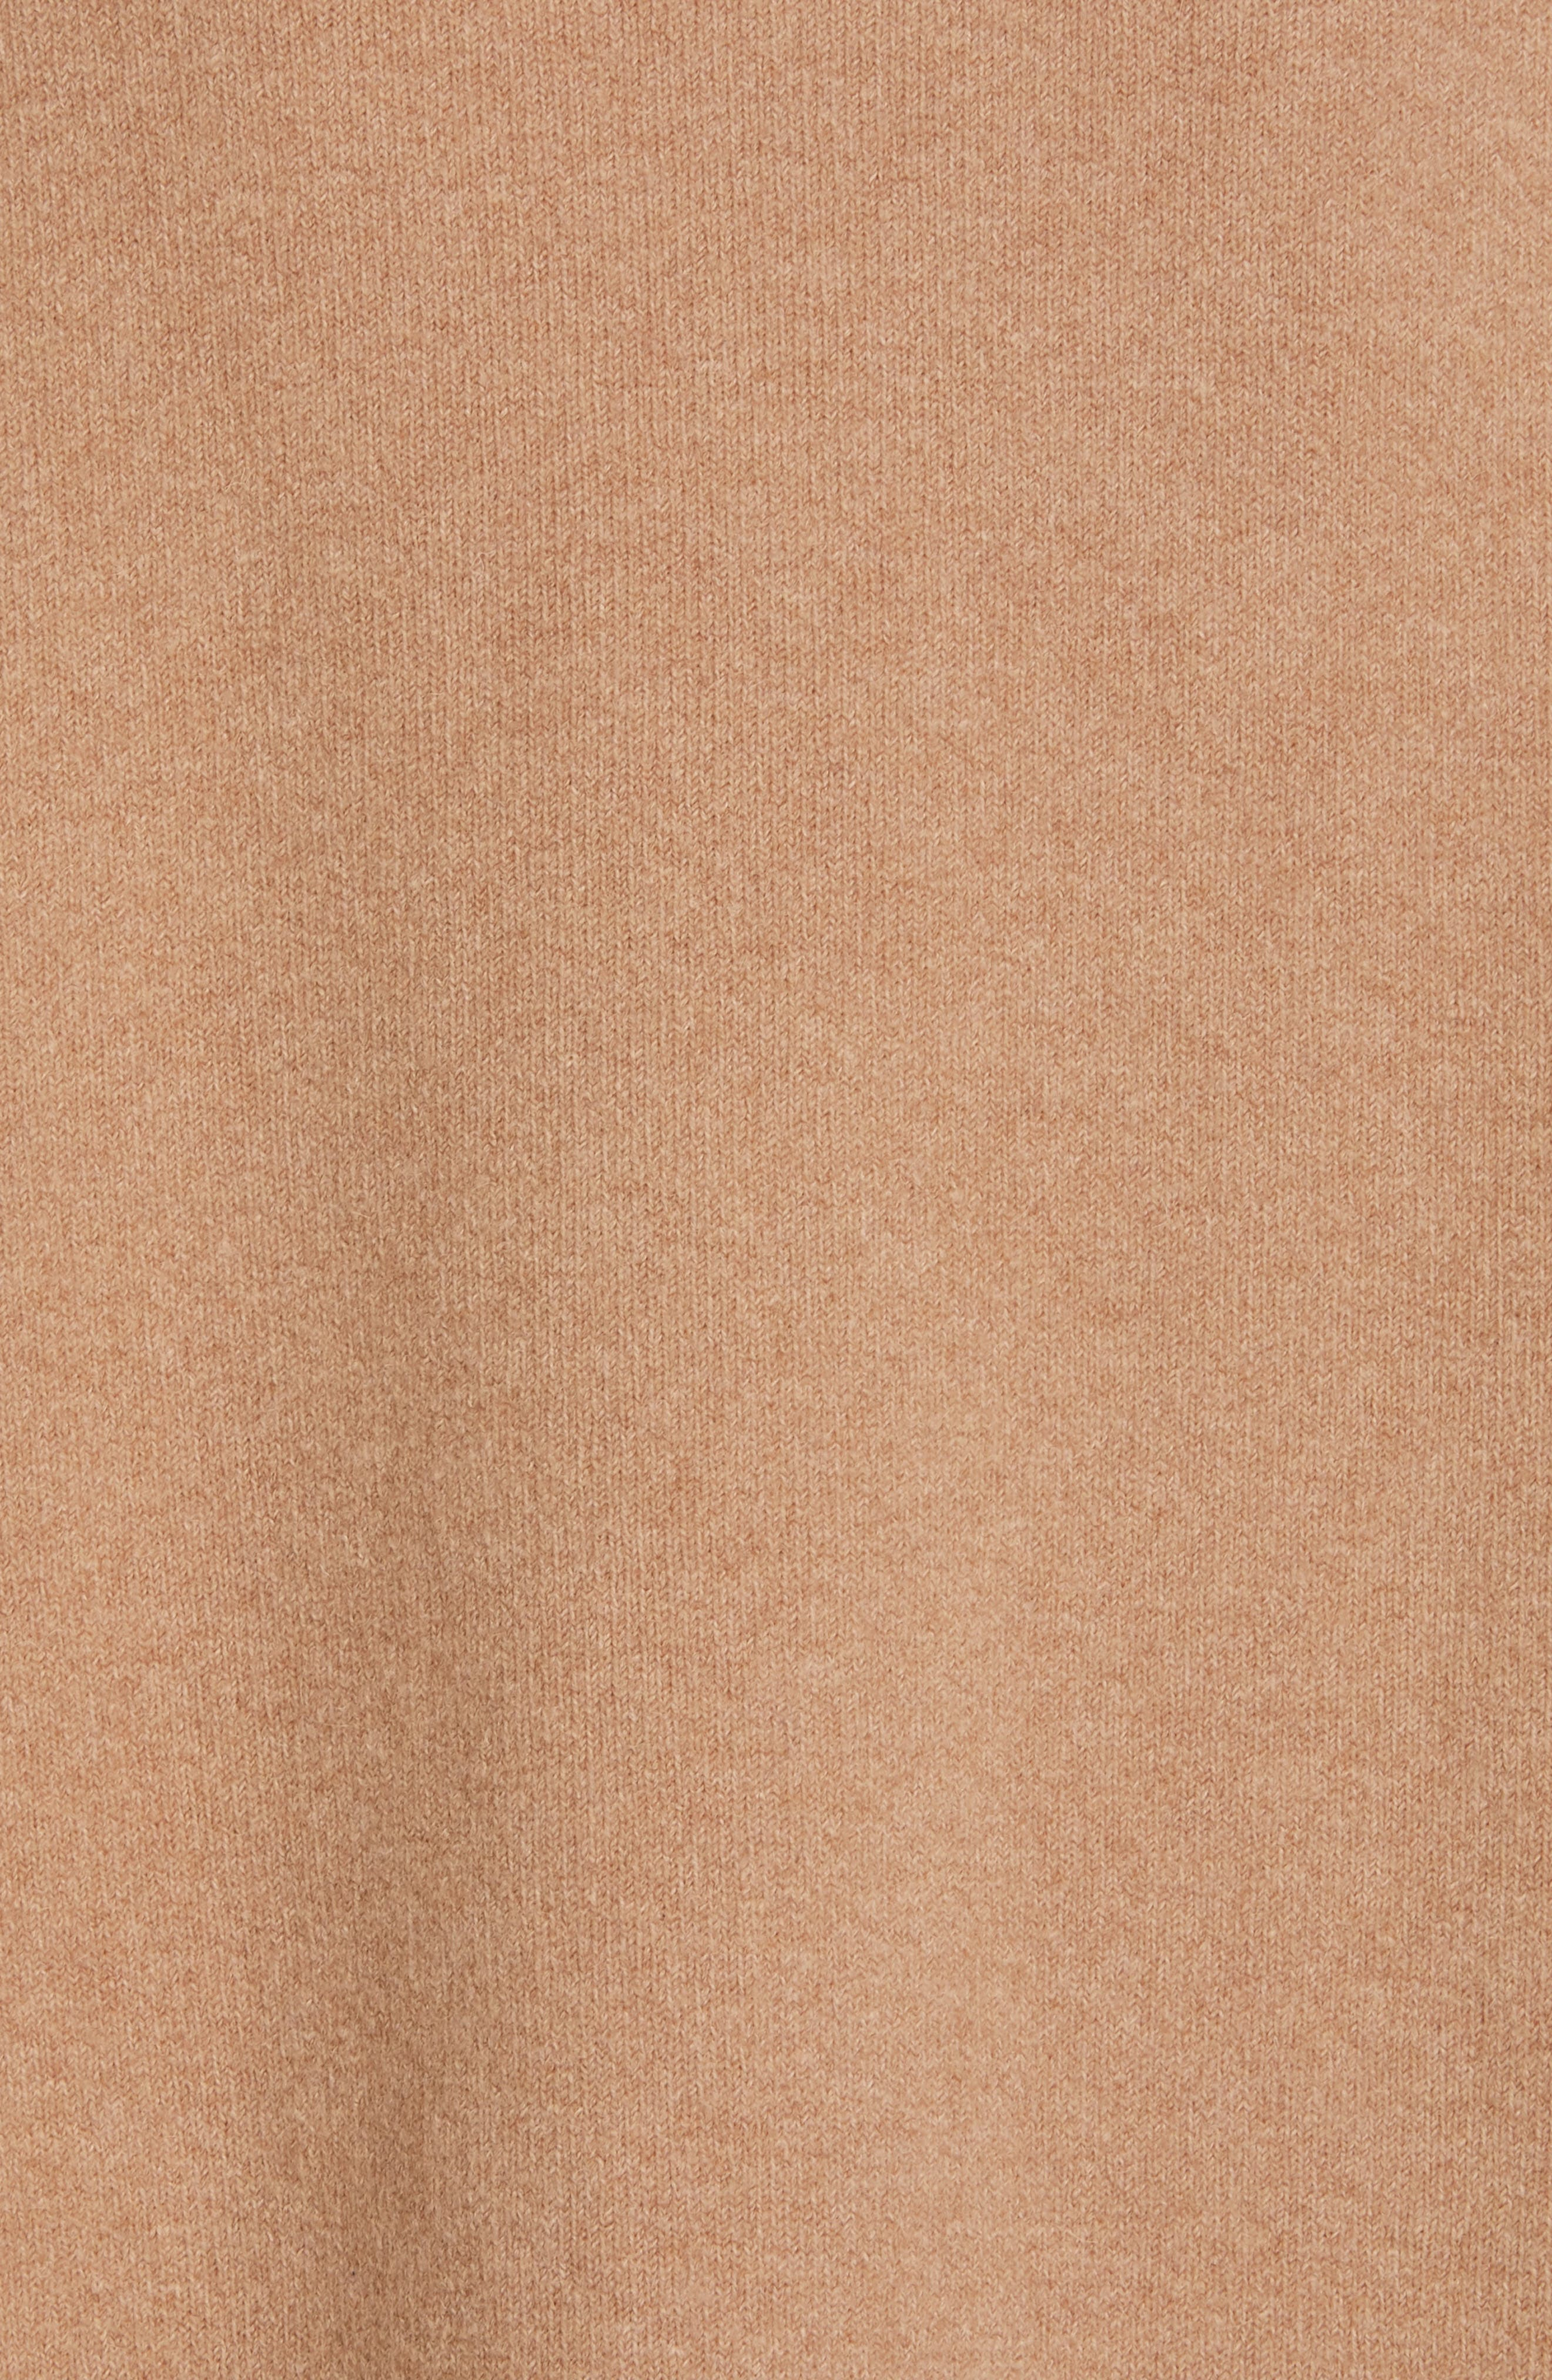 Cortis Merino Wool & Alpaca Blend Sweater,                             Alternate thumbnail 5, color,                             CAMEL